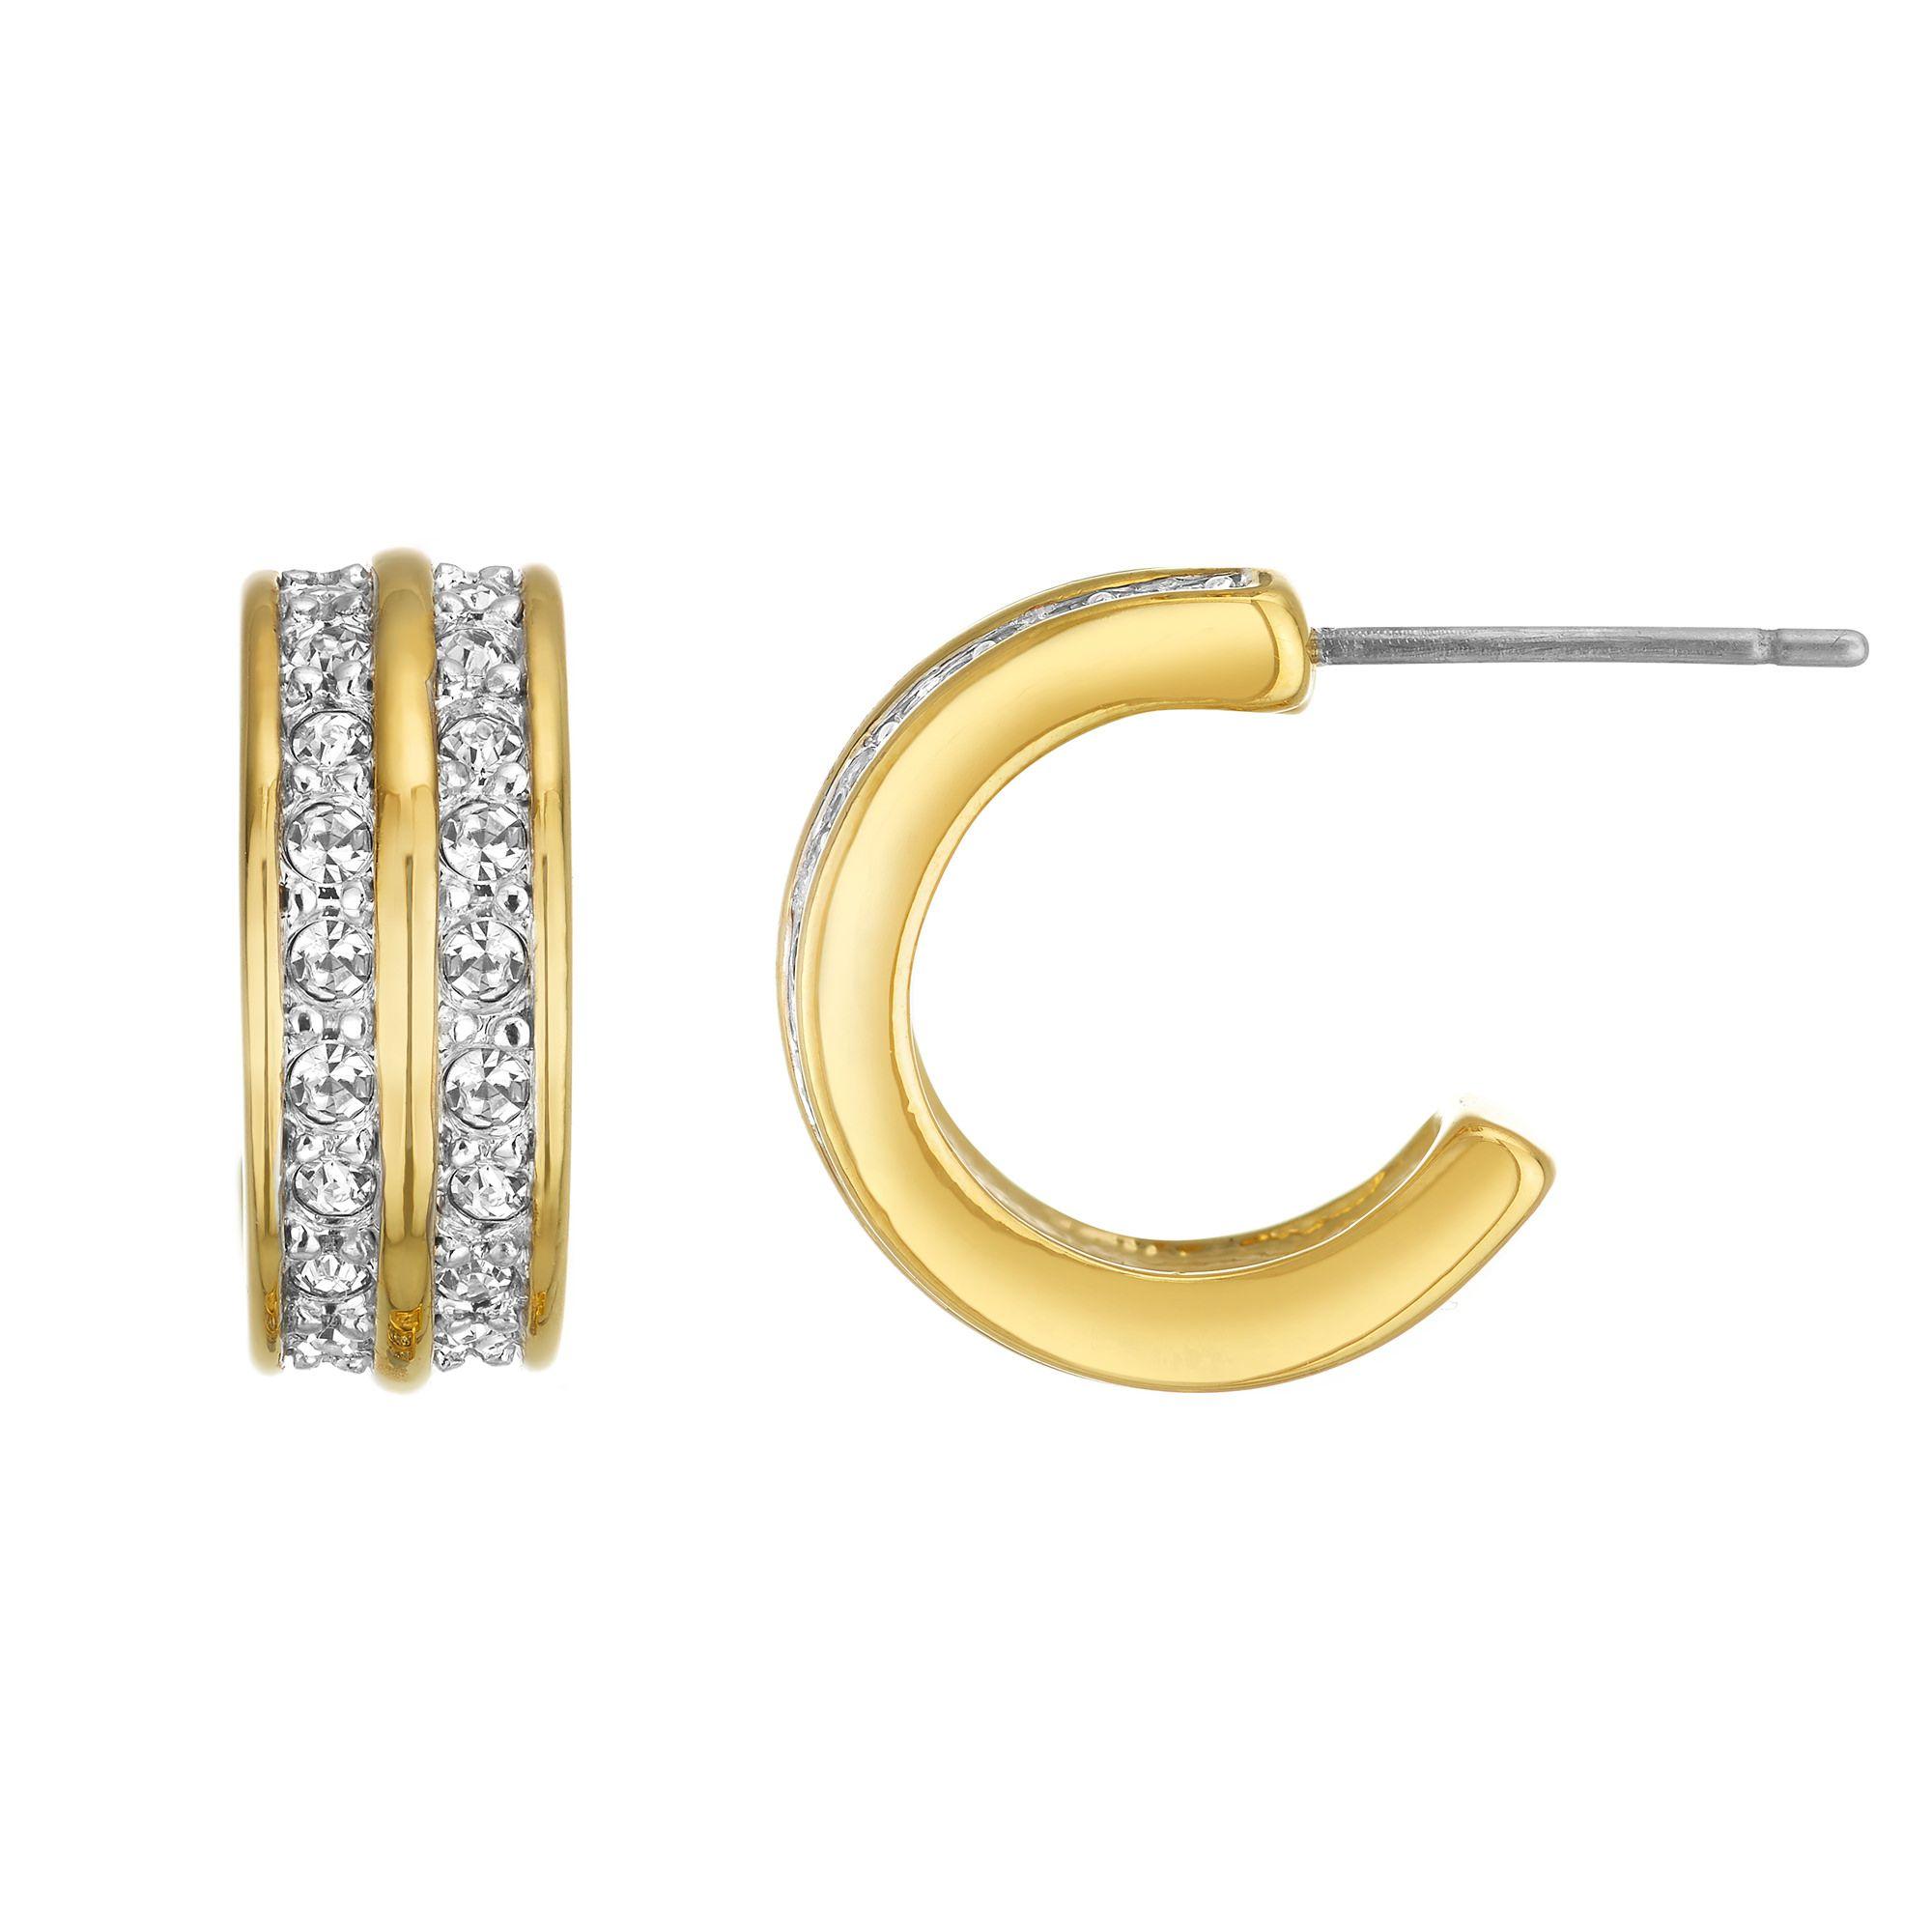 Buckley London Classic Gold Hoop Earrings